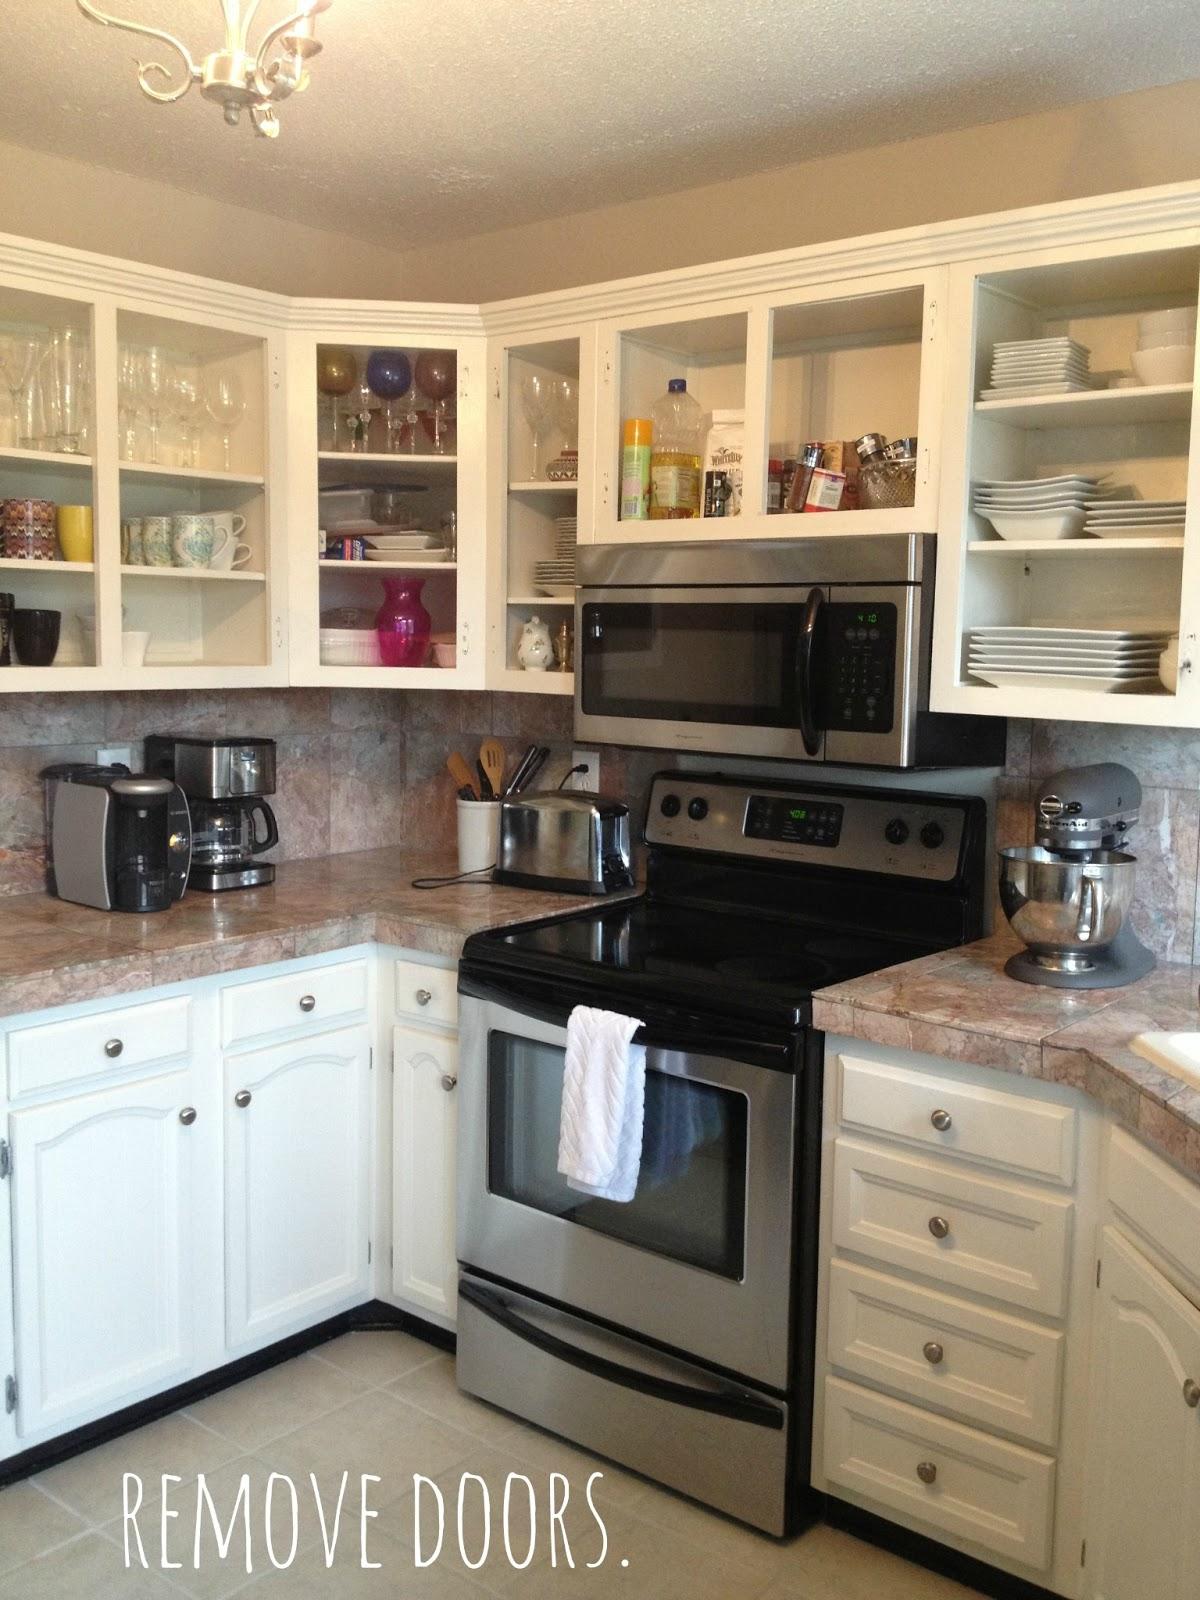 Kitchen Cabinets Without Doors  newsdecor com